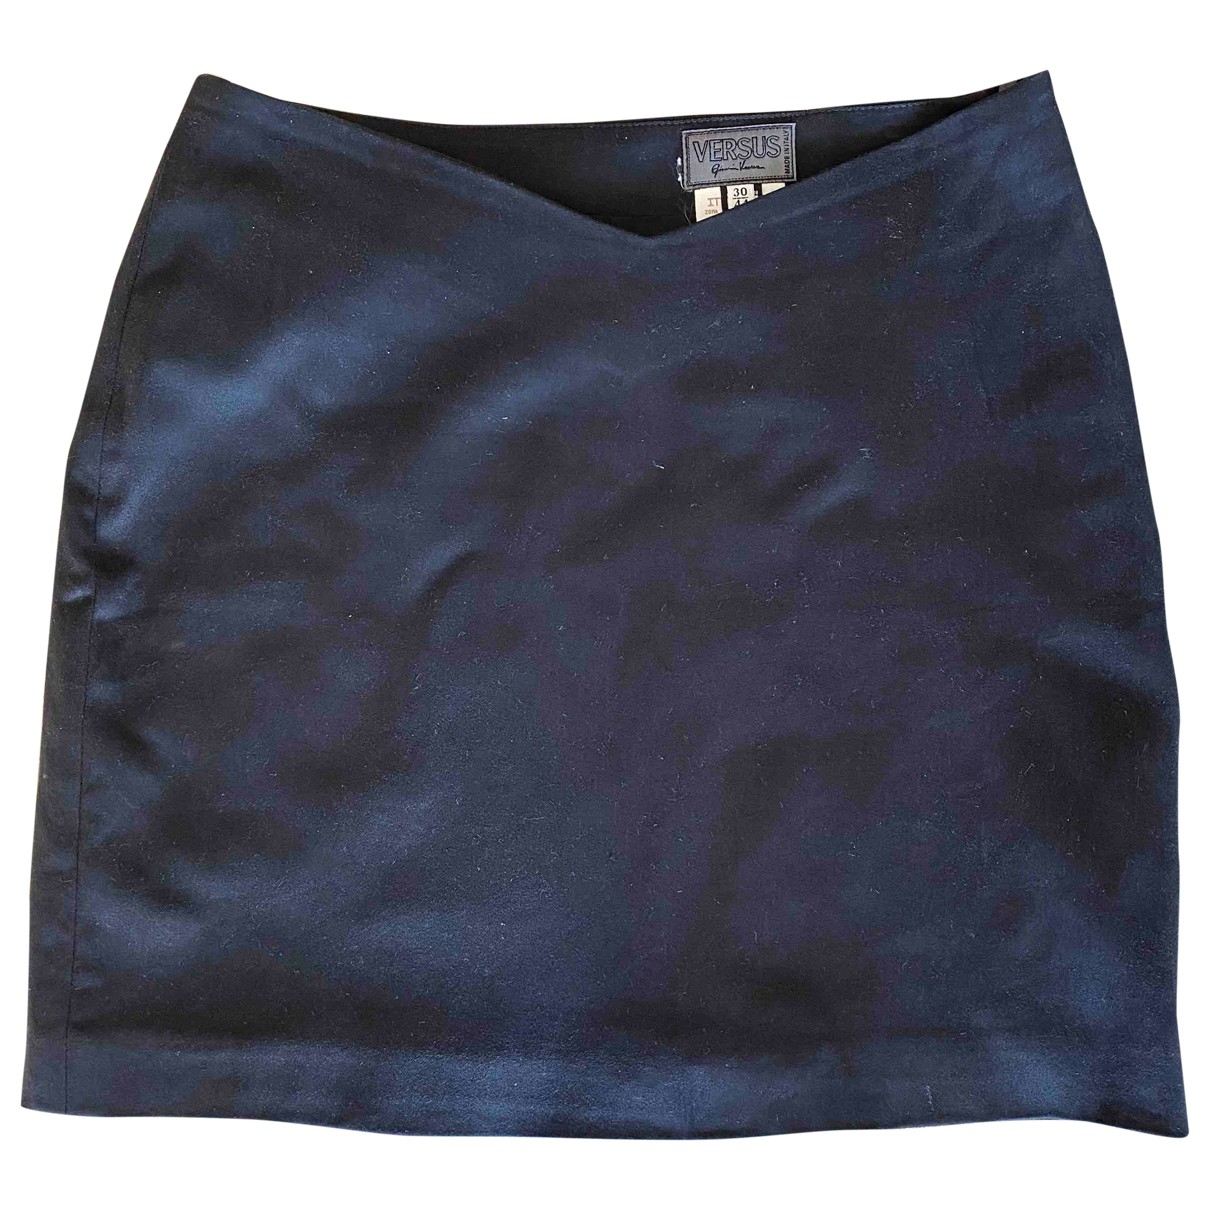 Versus \N Black Cotton skirt for Women 44 IT